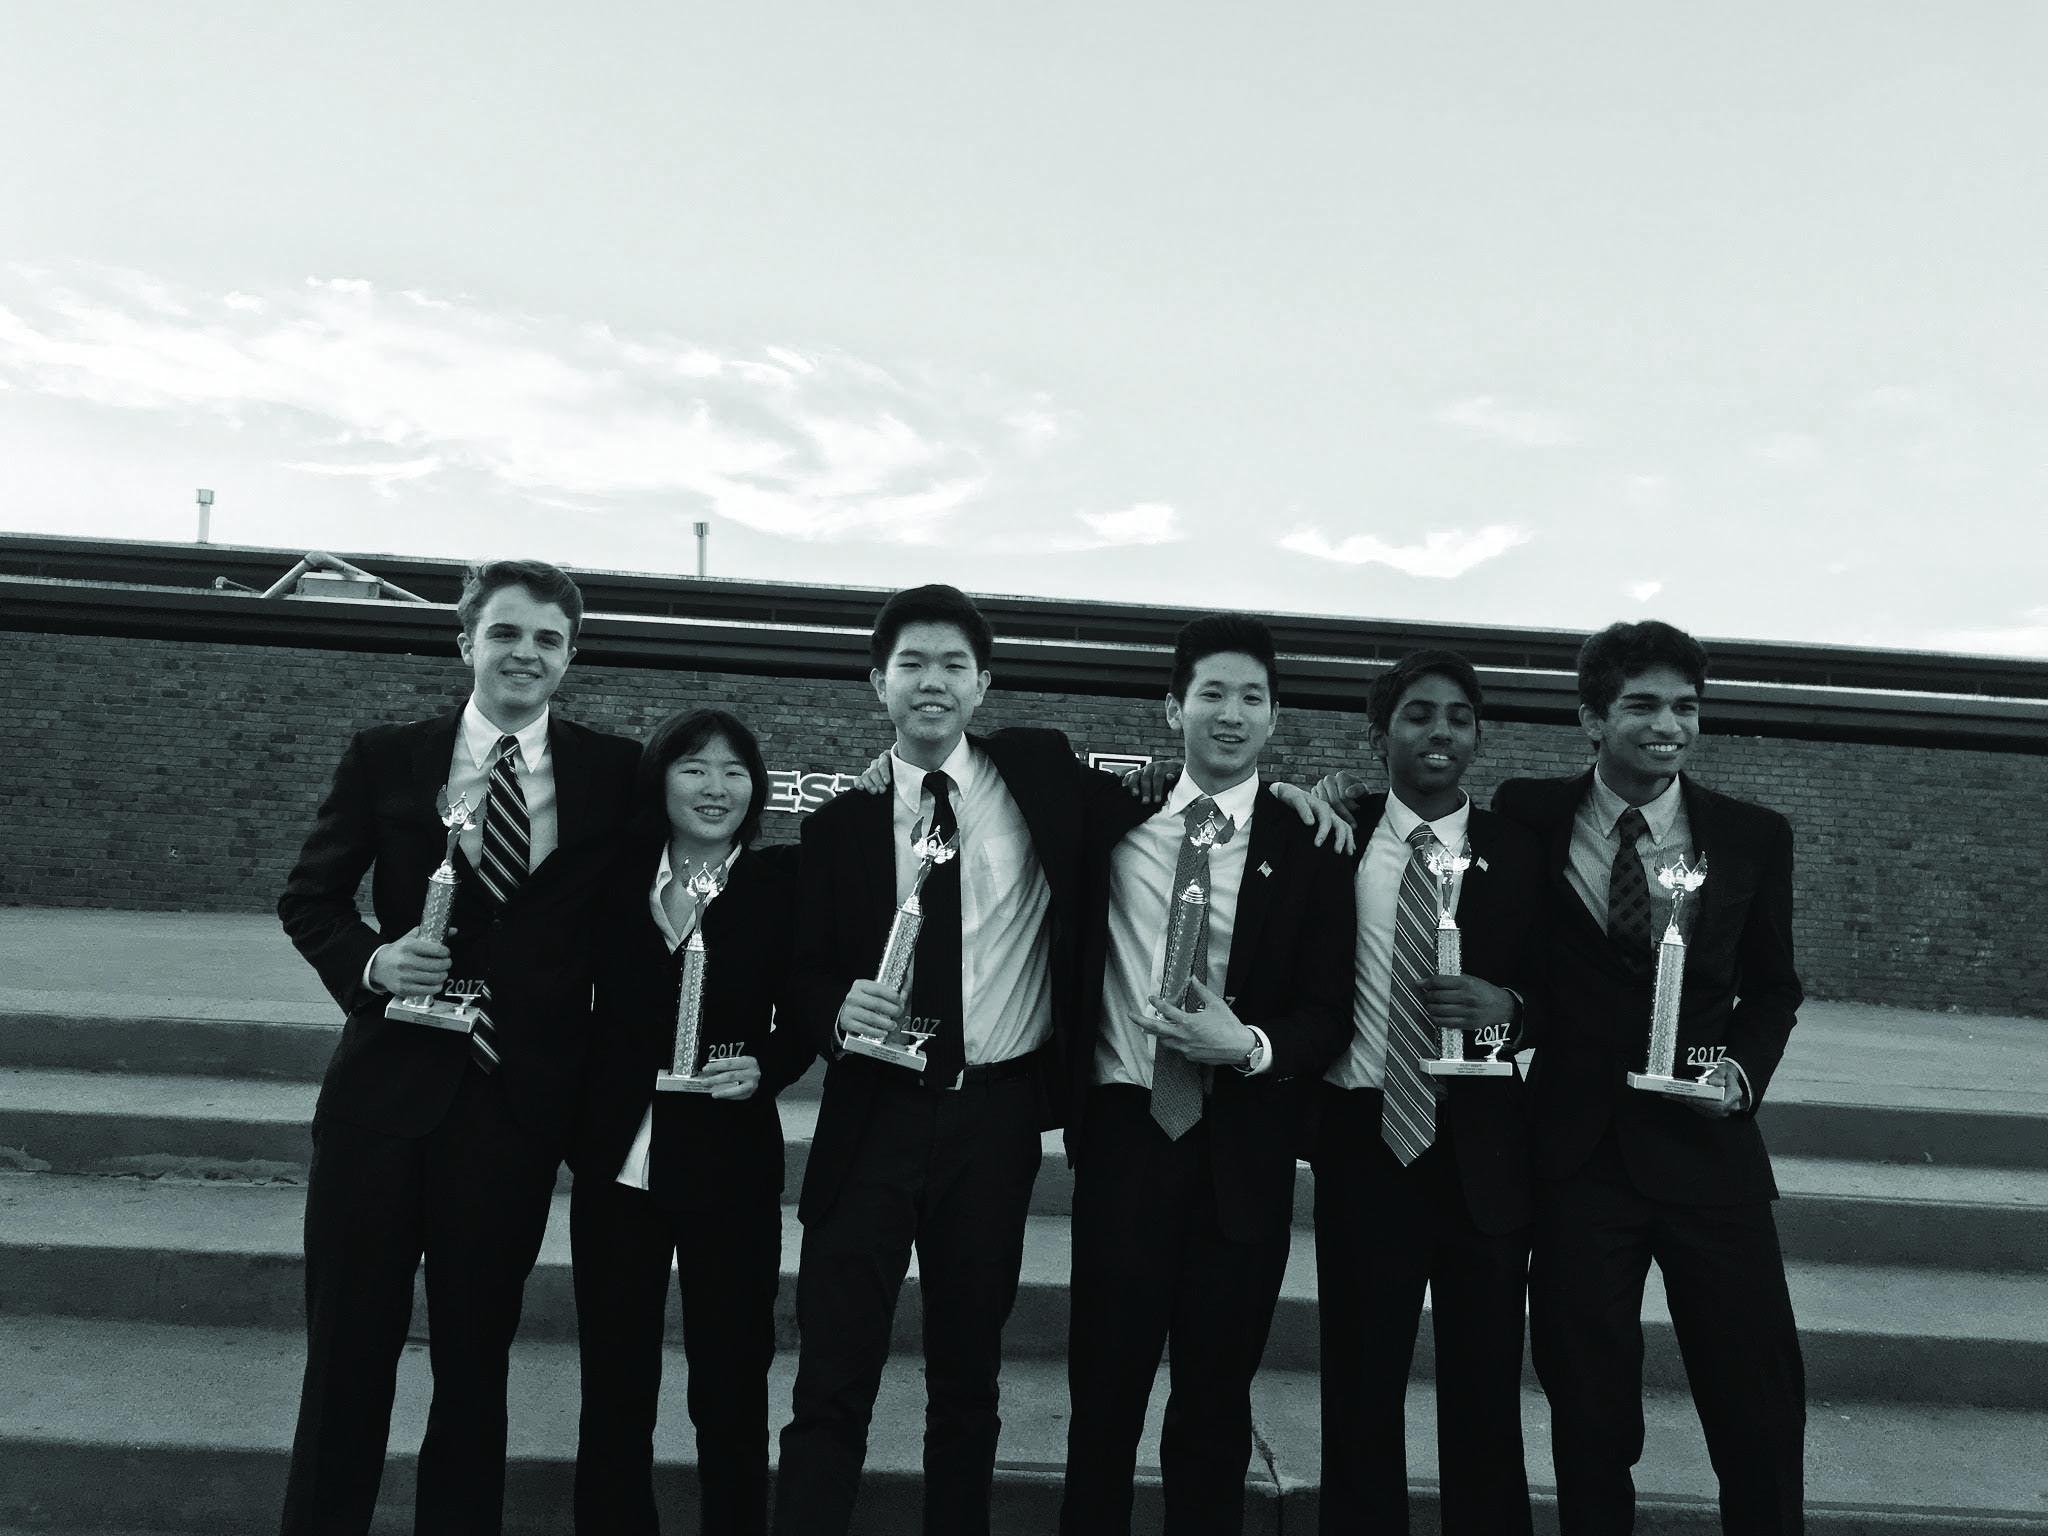 Debate team dominates regional, league tournaments